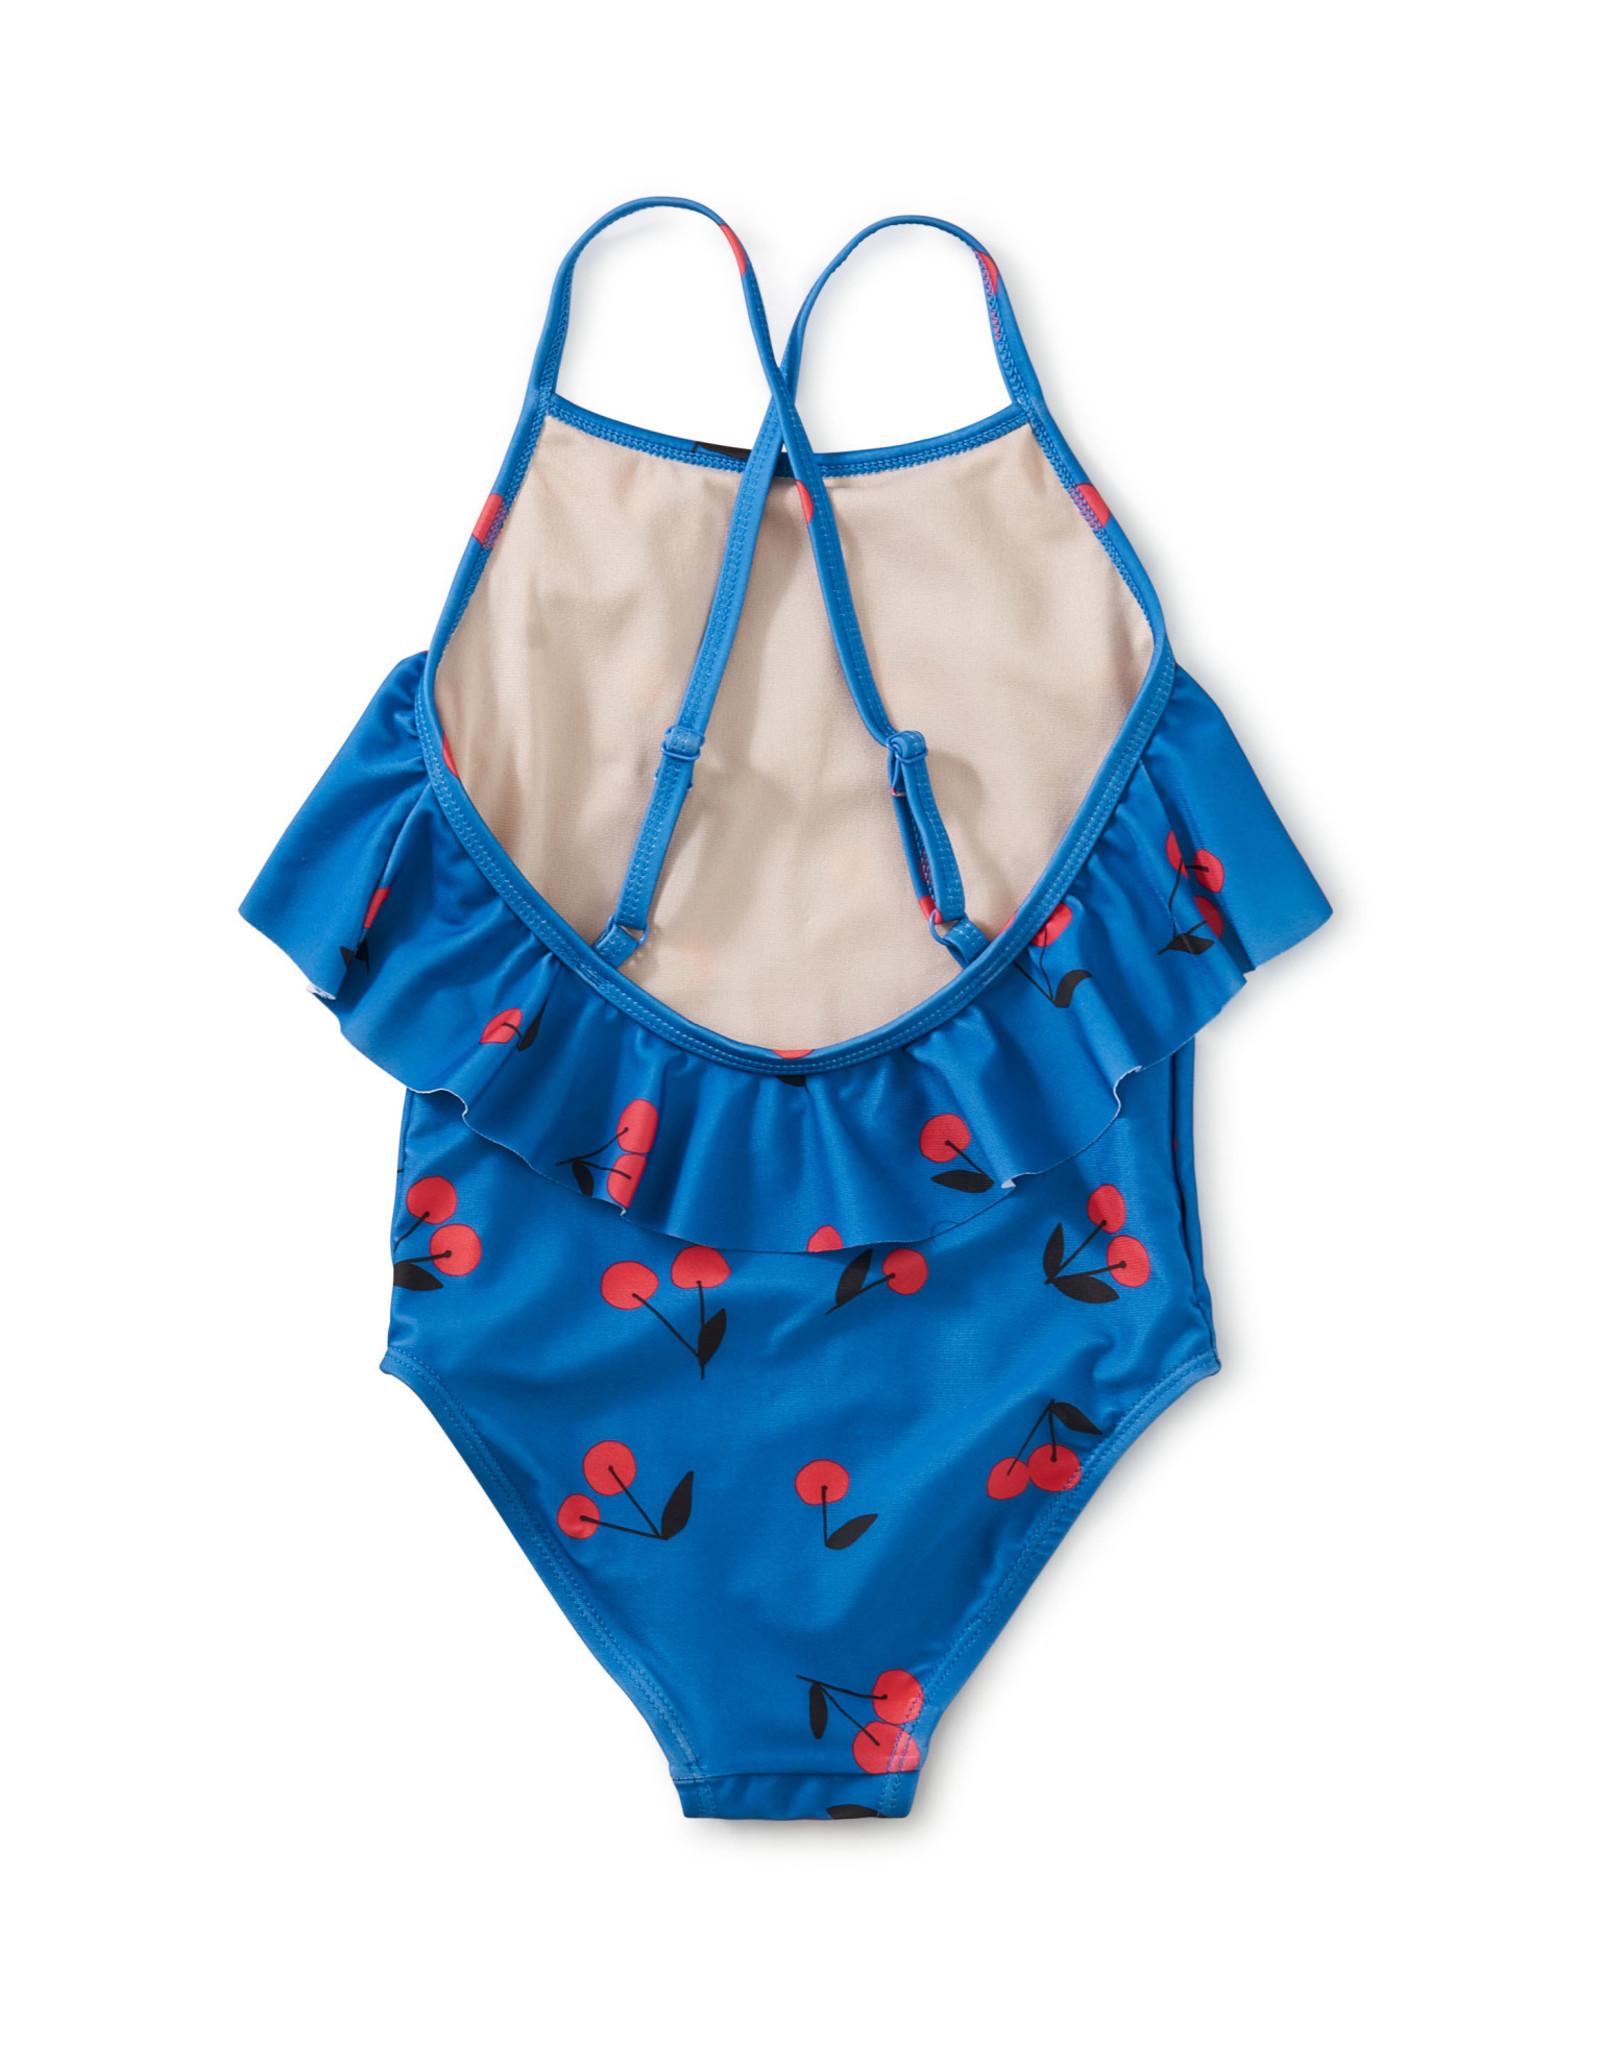 Tea Flutter One-Piece Swimsuit, Ginja Cherry in Blue